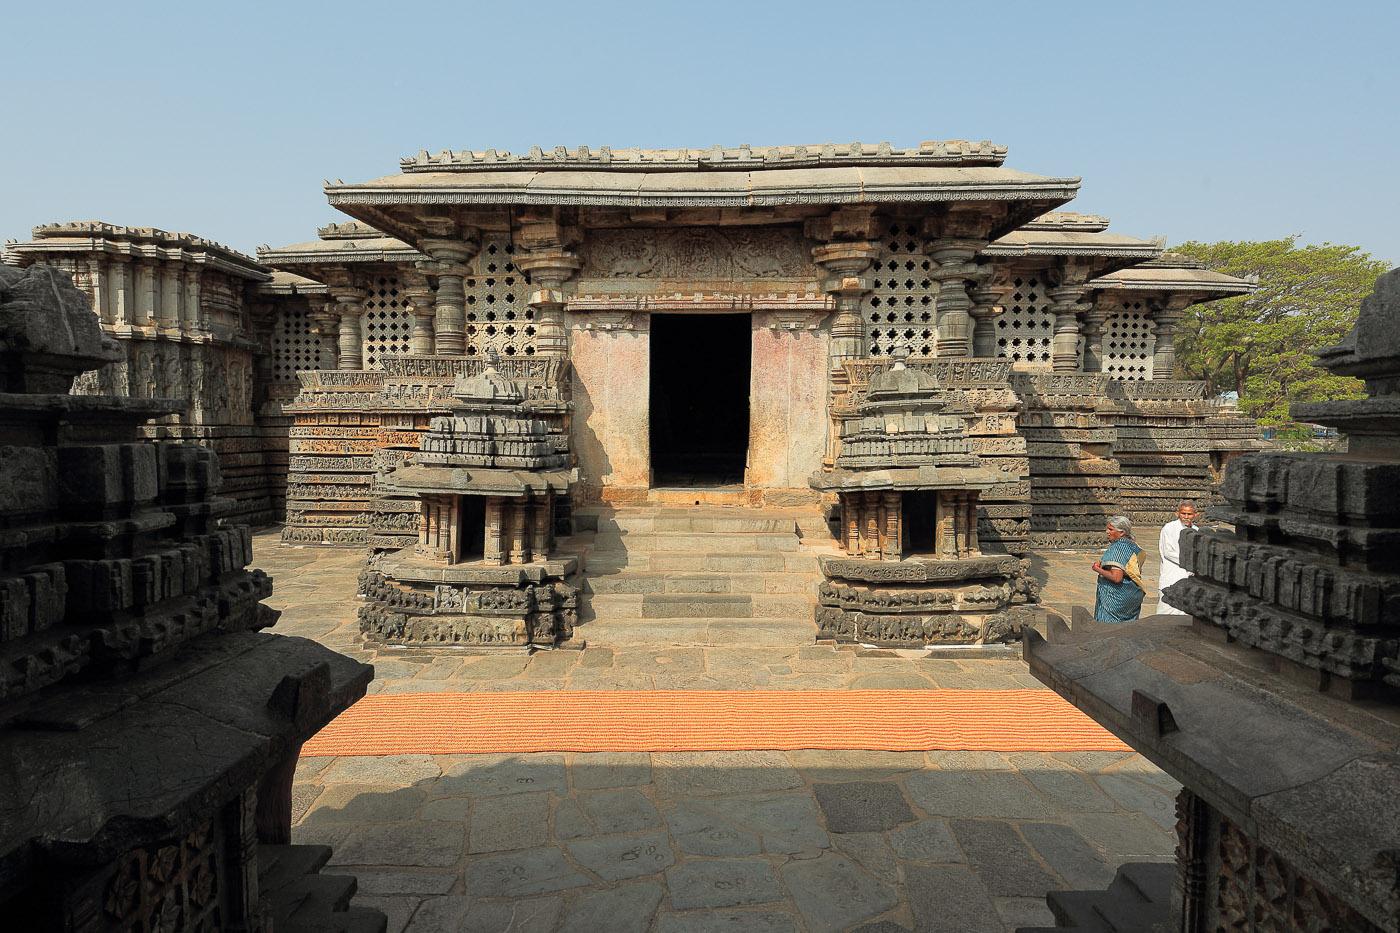 Фото №10. Южный вход в храм. Canon 17-40, 1/80, 0 eV, f 9, 17 mm, ISO 100